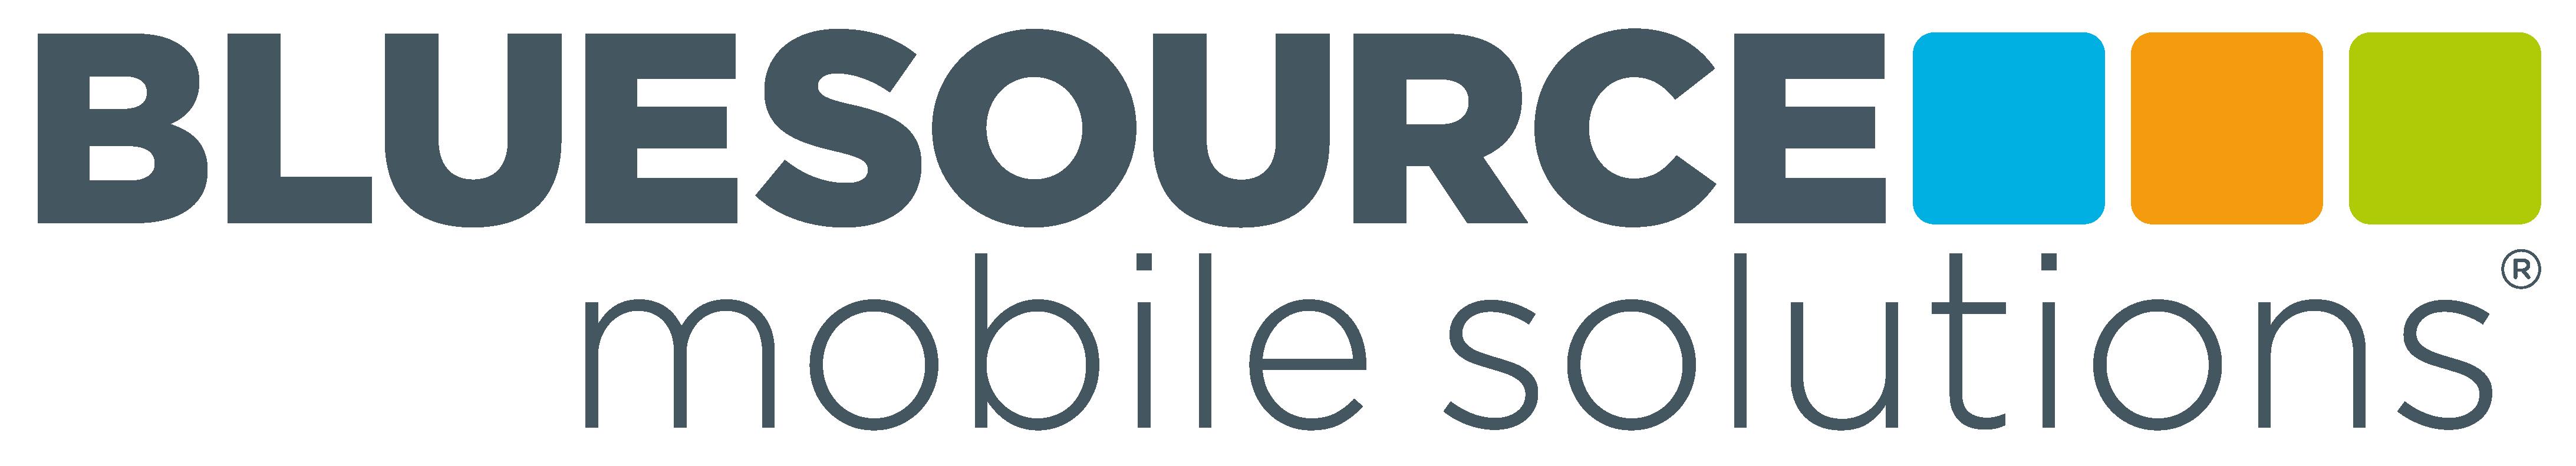 bluesource_logo